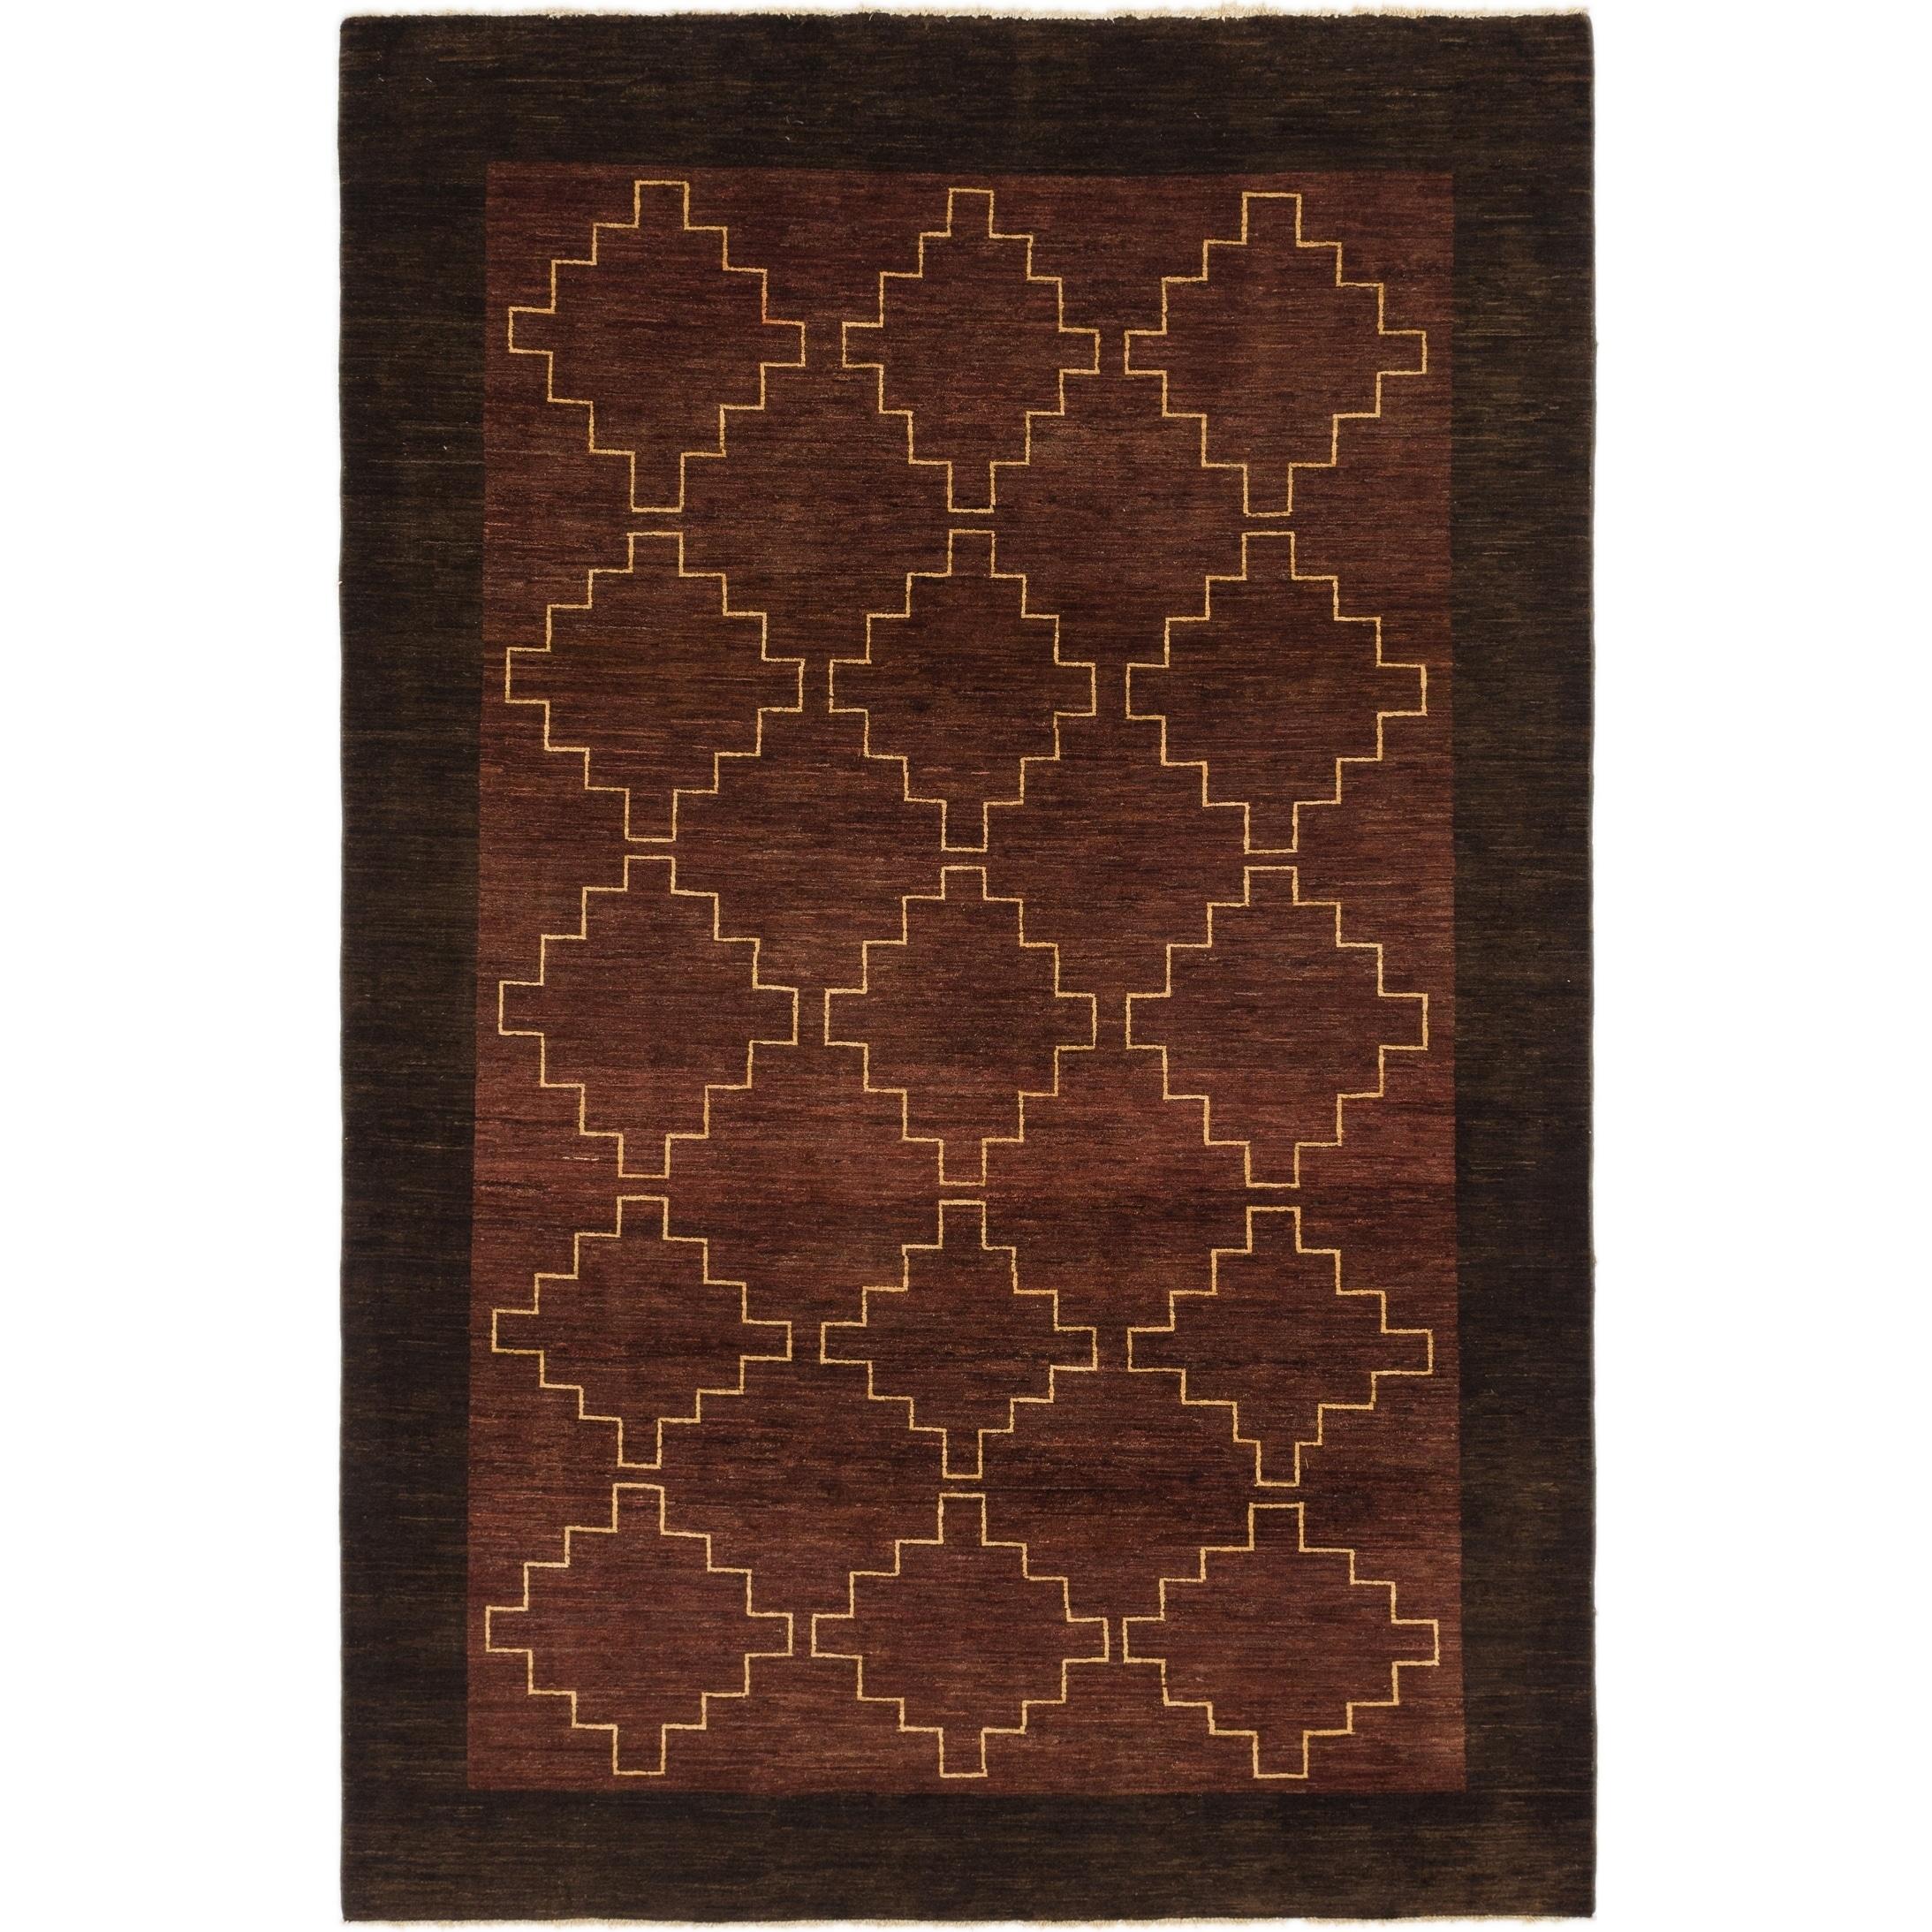 Hand Knotted Kashkuli Gabbeh Wool Area Rug - 6 5 x 9 10 (Burgundy - 6 5 x 9 10)